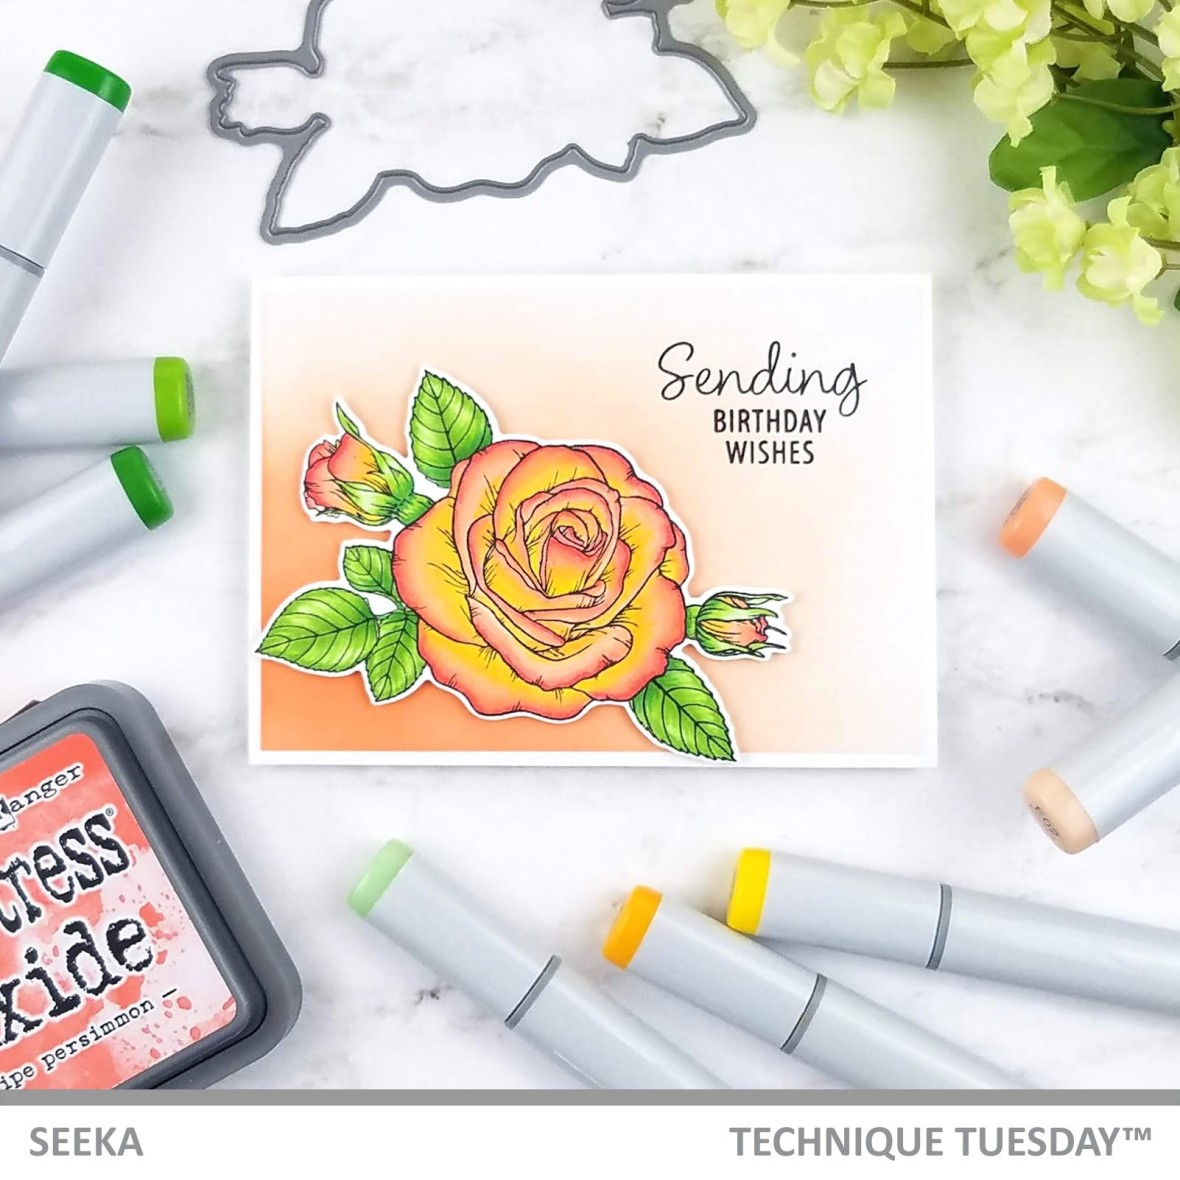 techniquetuesday-sendingroses-seeka-1a